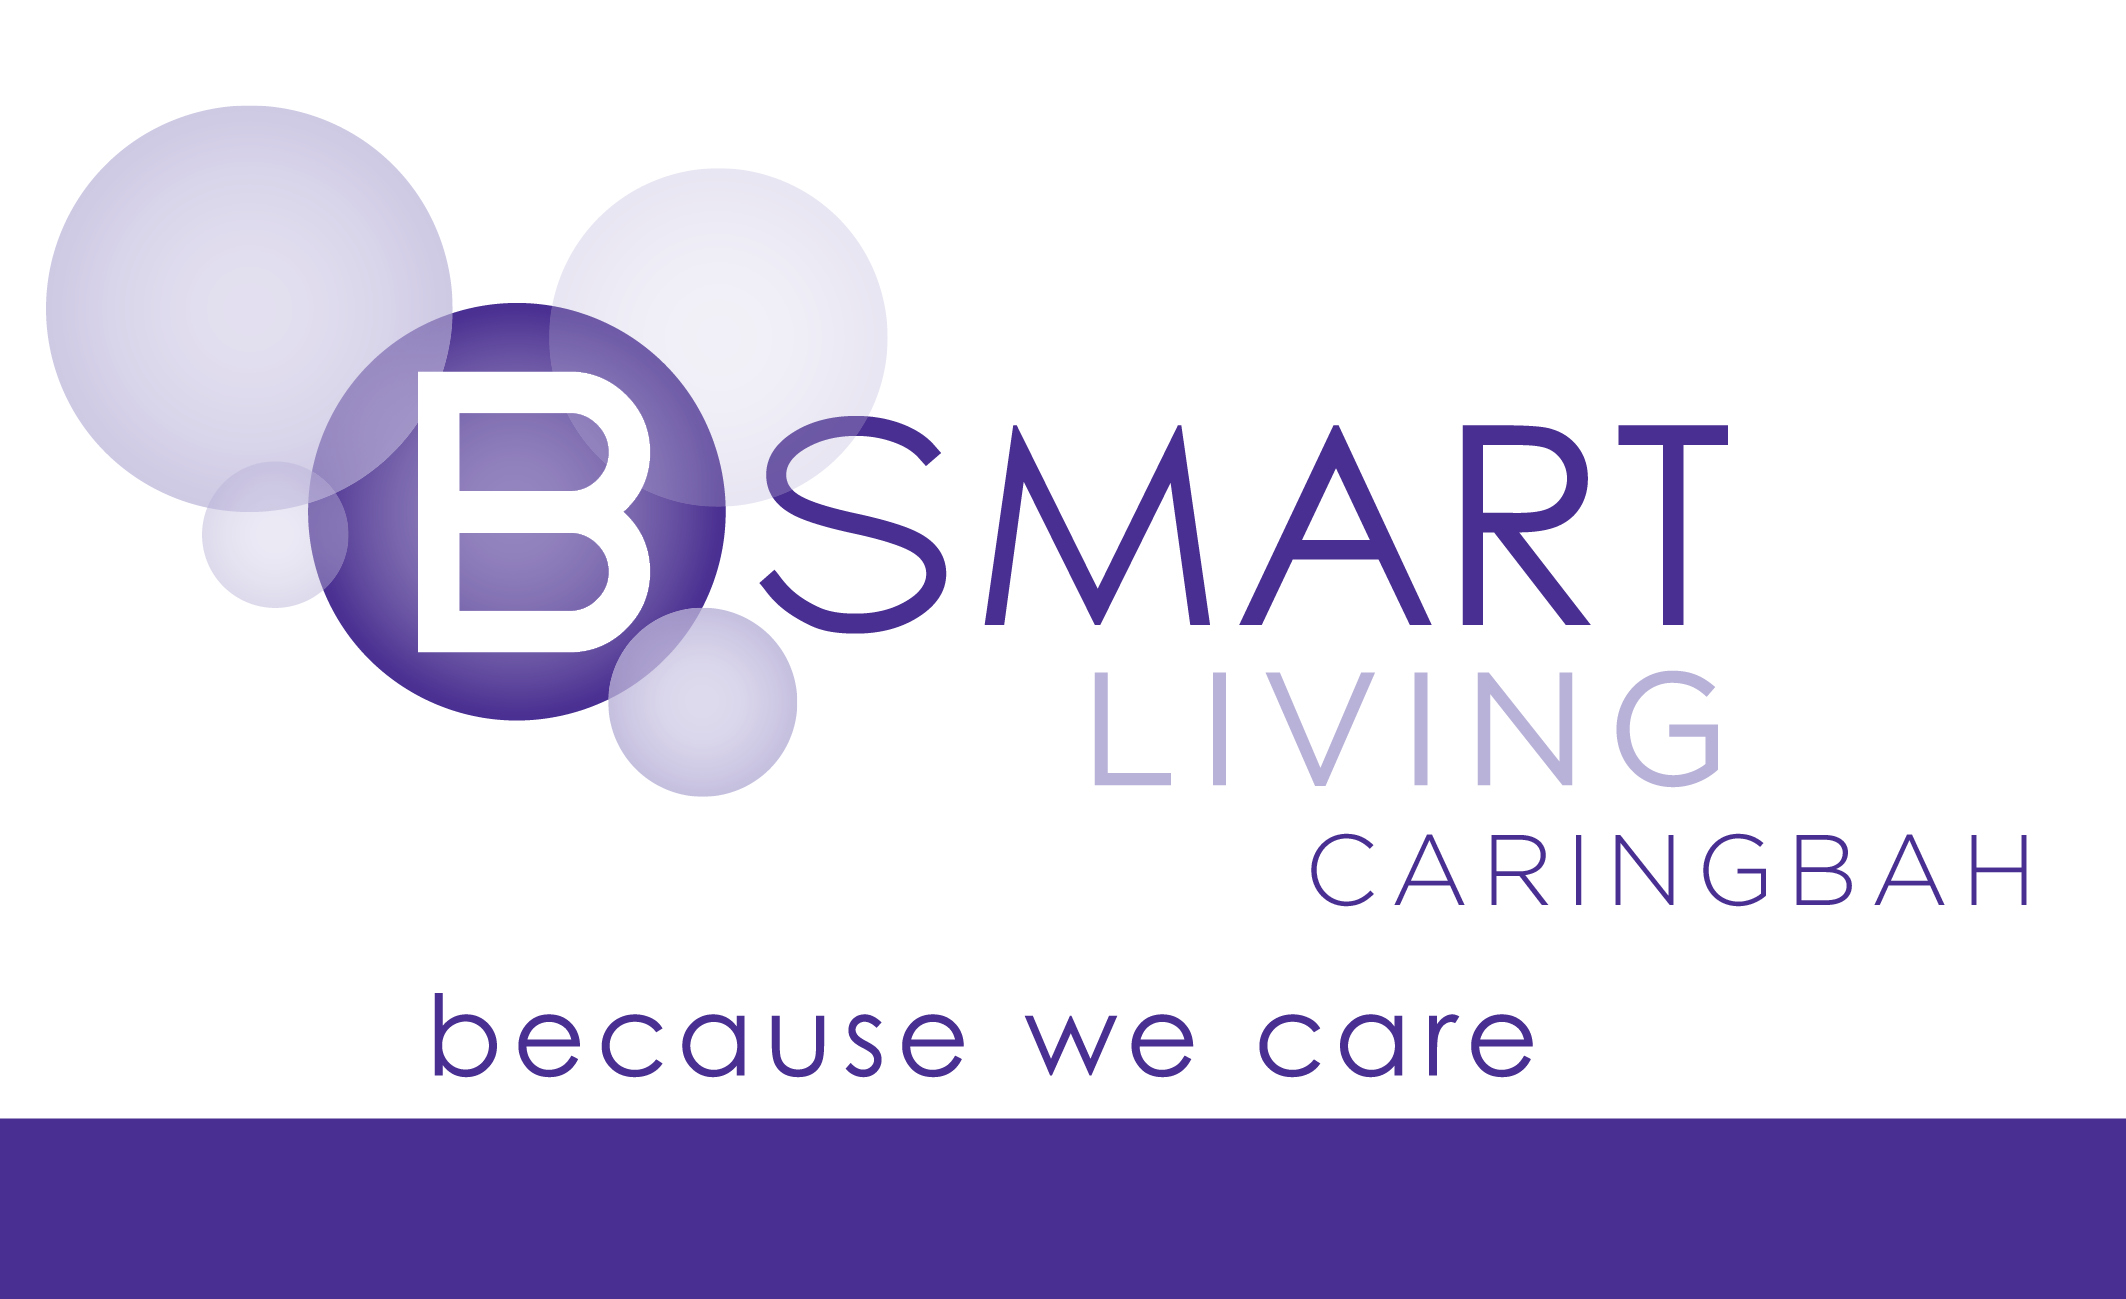 B Smart Living Caringbah